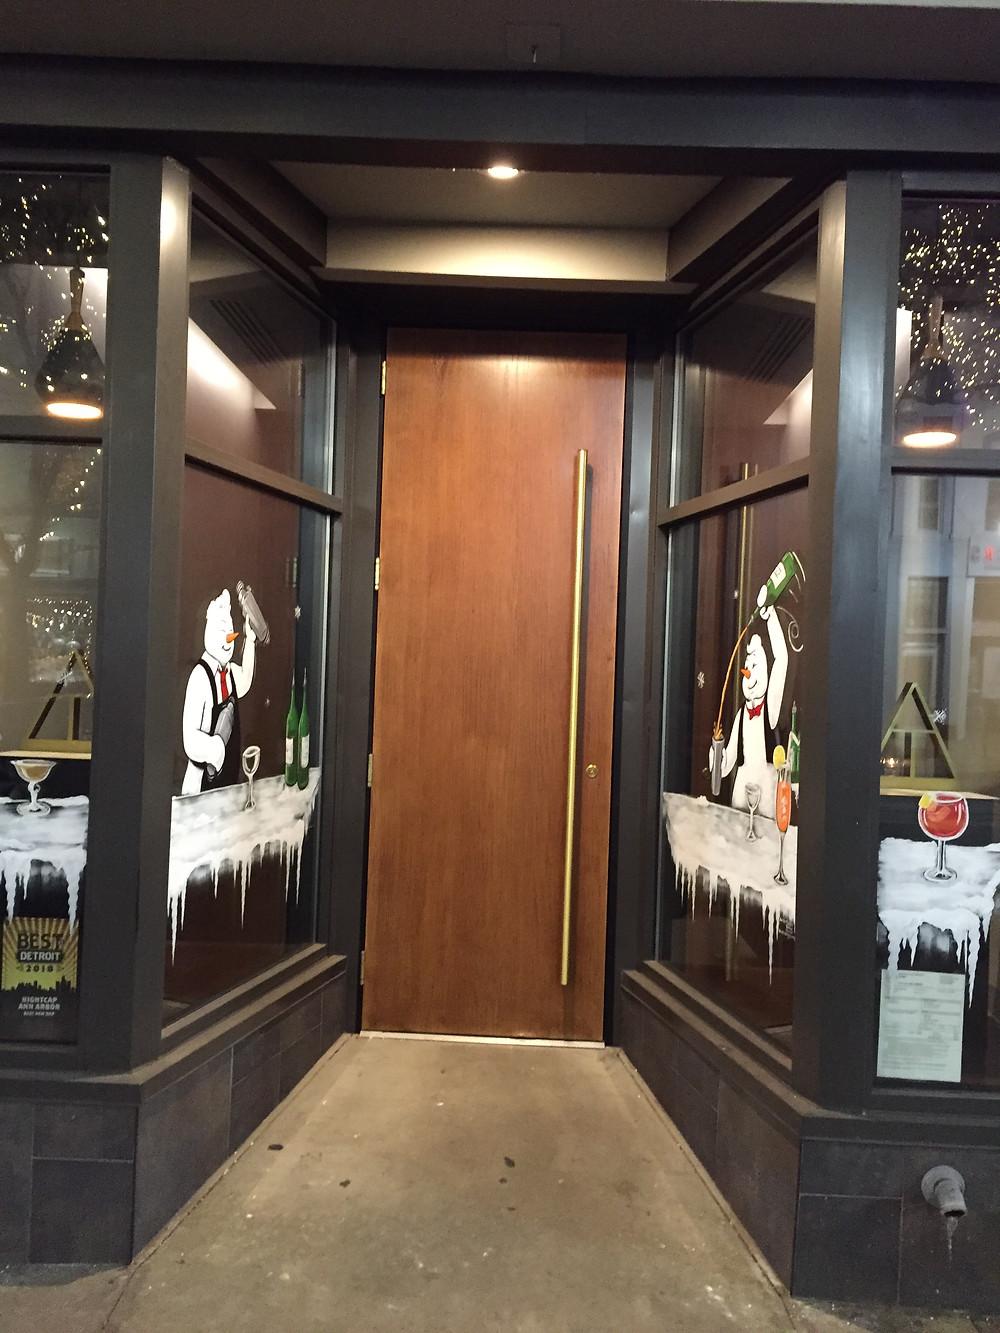 Entrance to nightcap -- speakeasy style